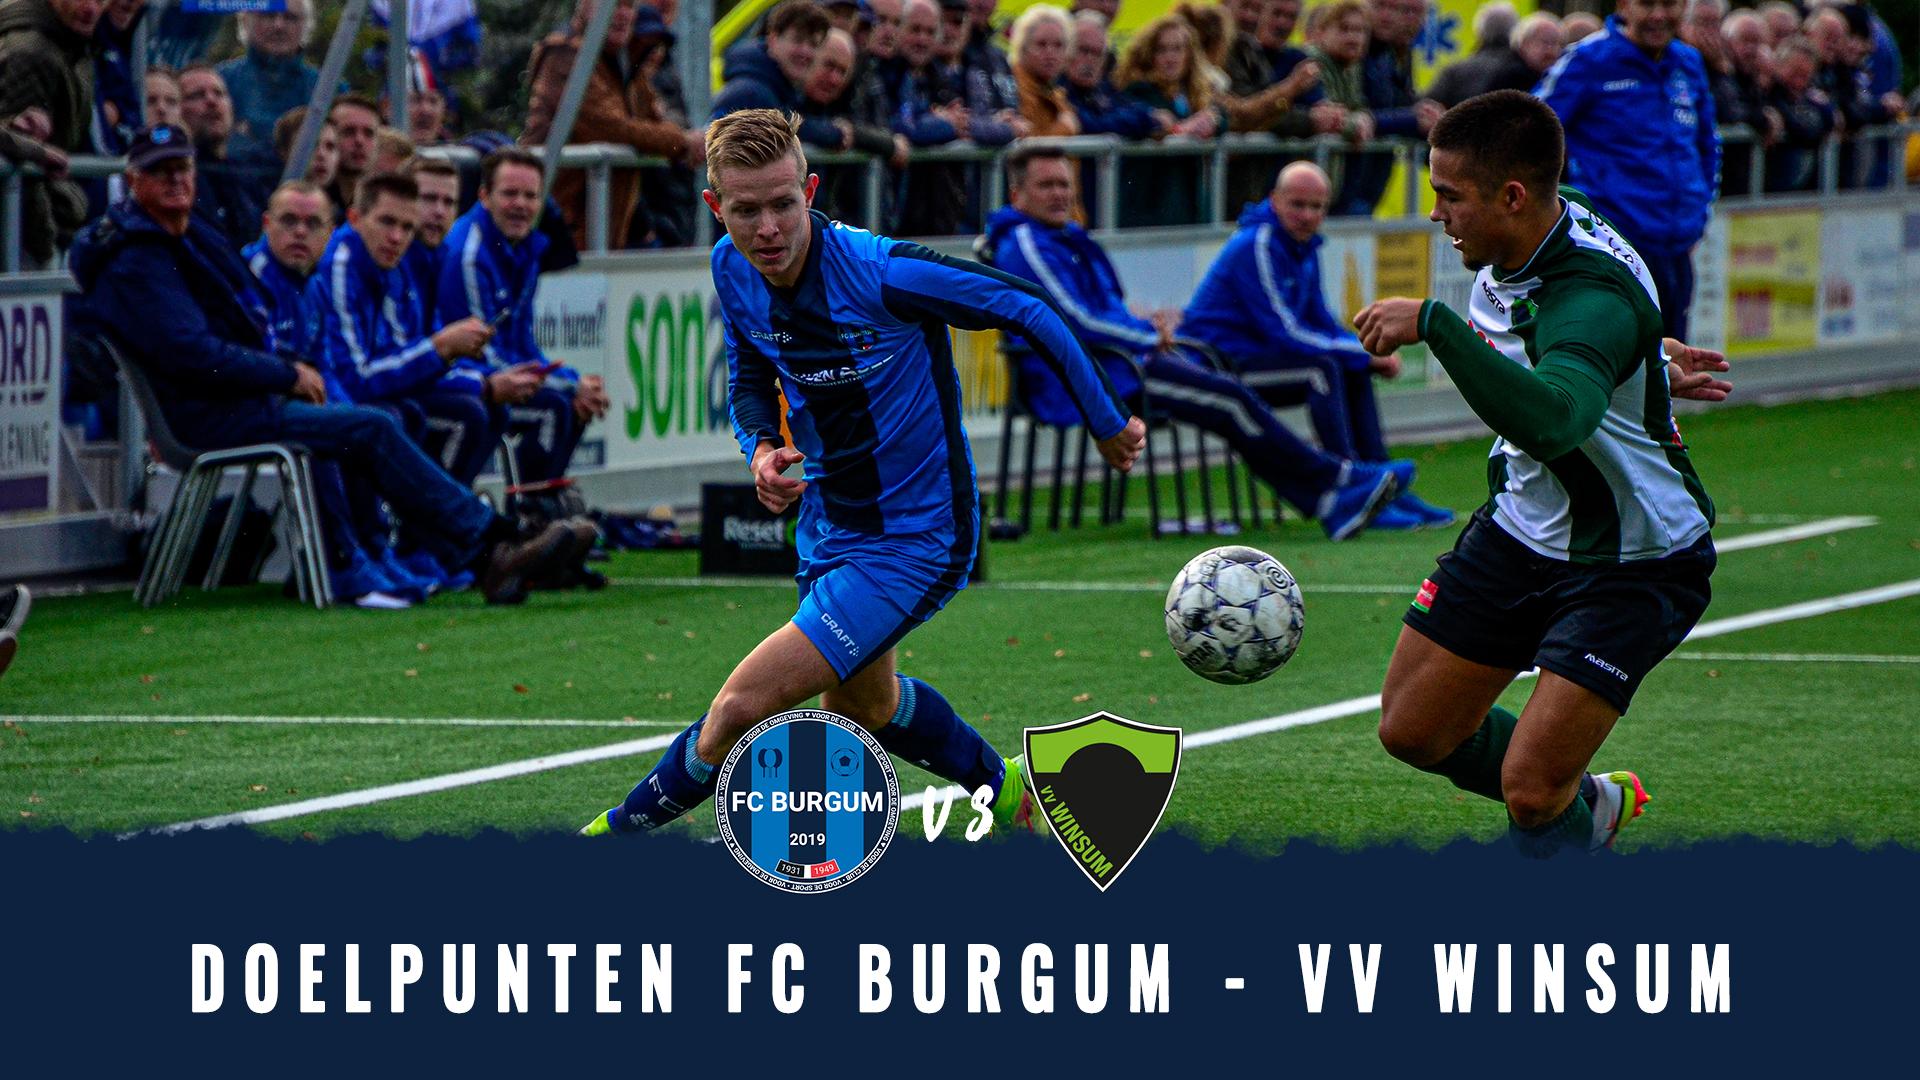 🎥 Doelpunten FC Burgum - VV Winsum